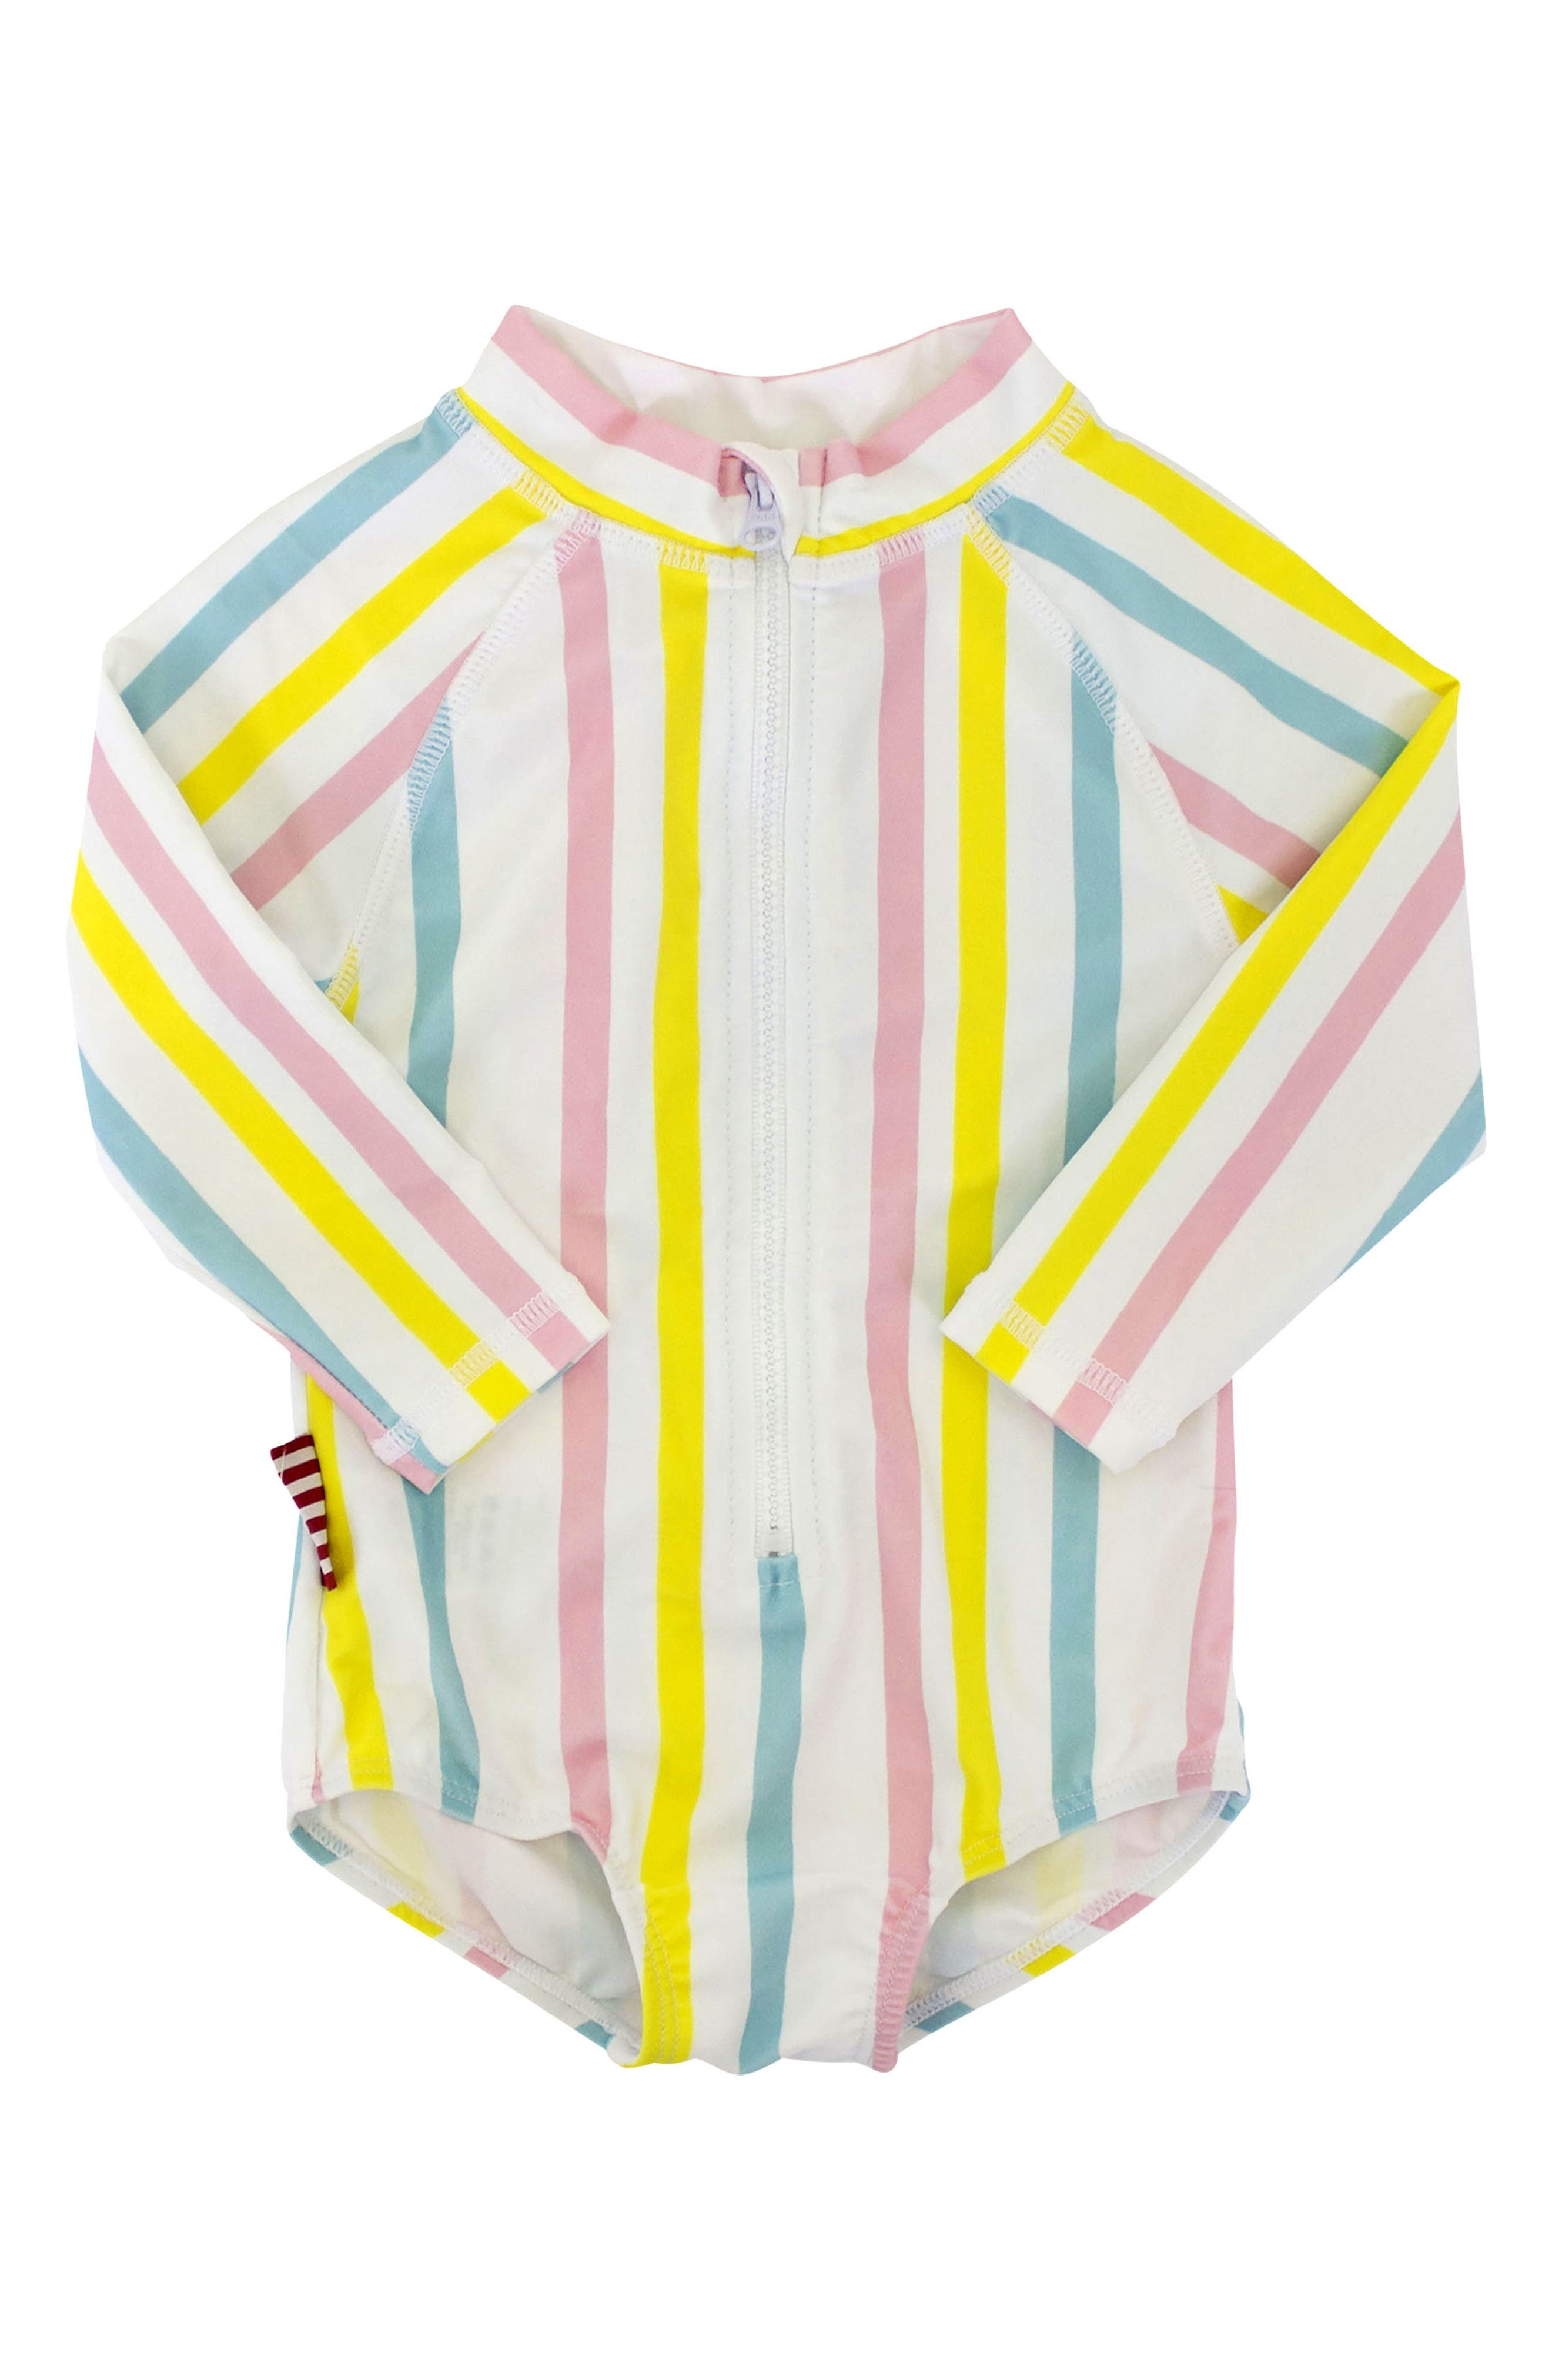 Stripe One-Piece Rashguard Swimsuit,                         Main,                         color, Yellow Multi